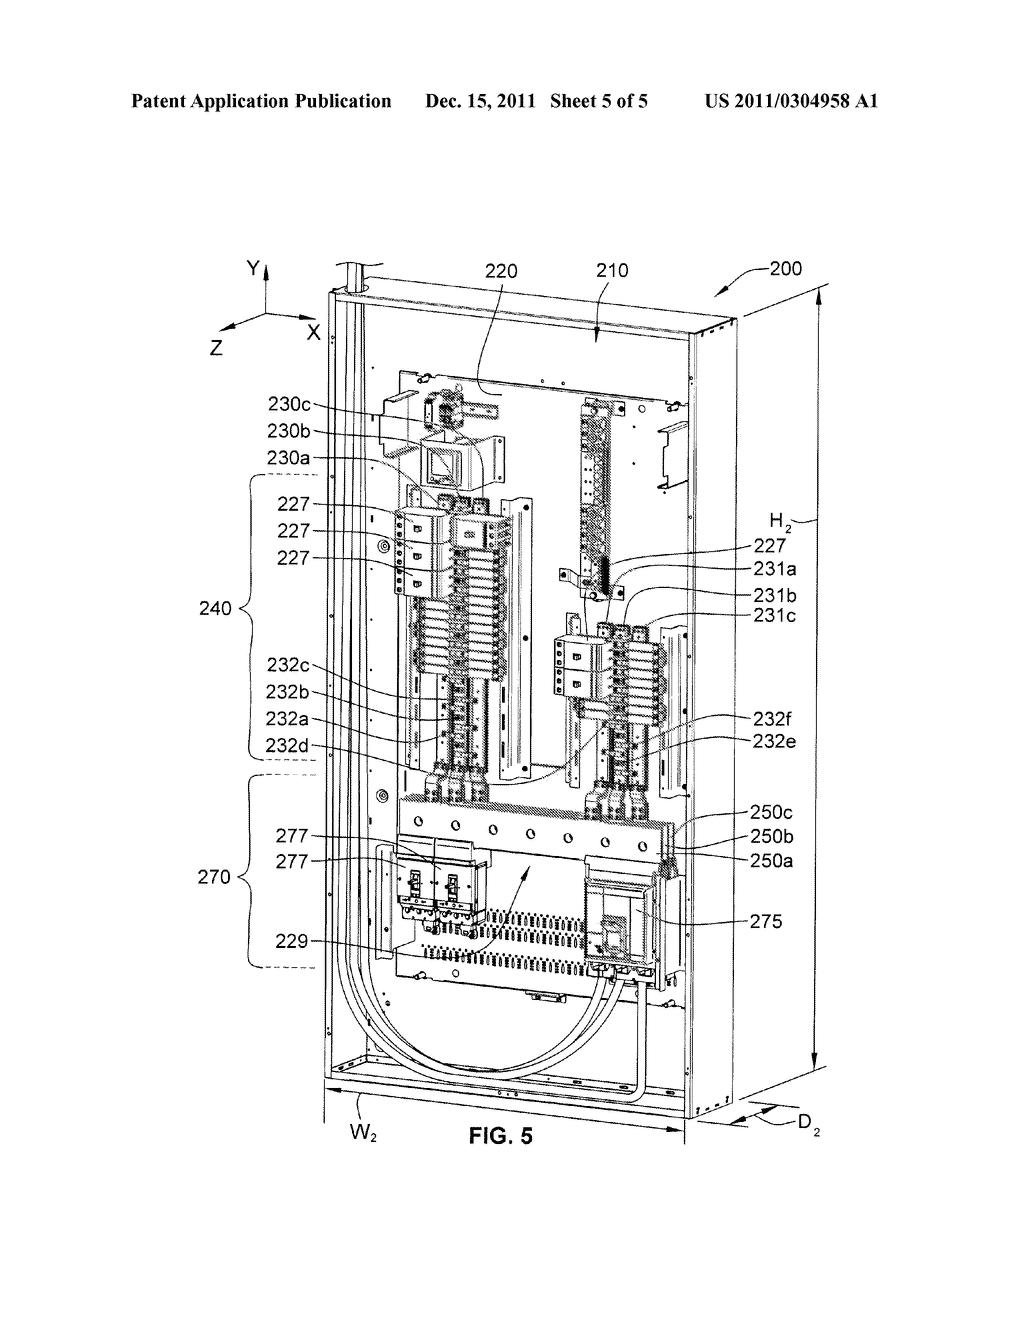 high density power lighting panelboard diagram schematic and rh patentsencyclopedia com